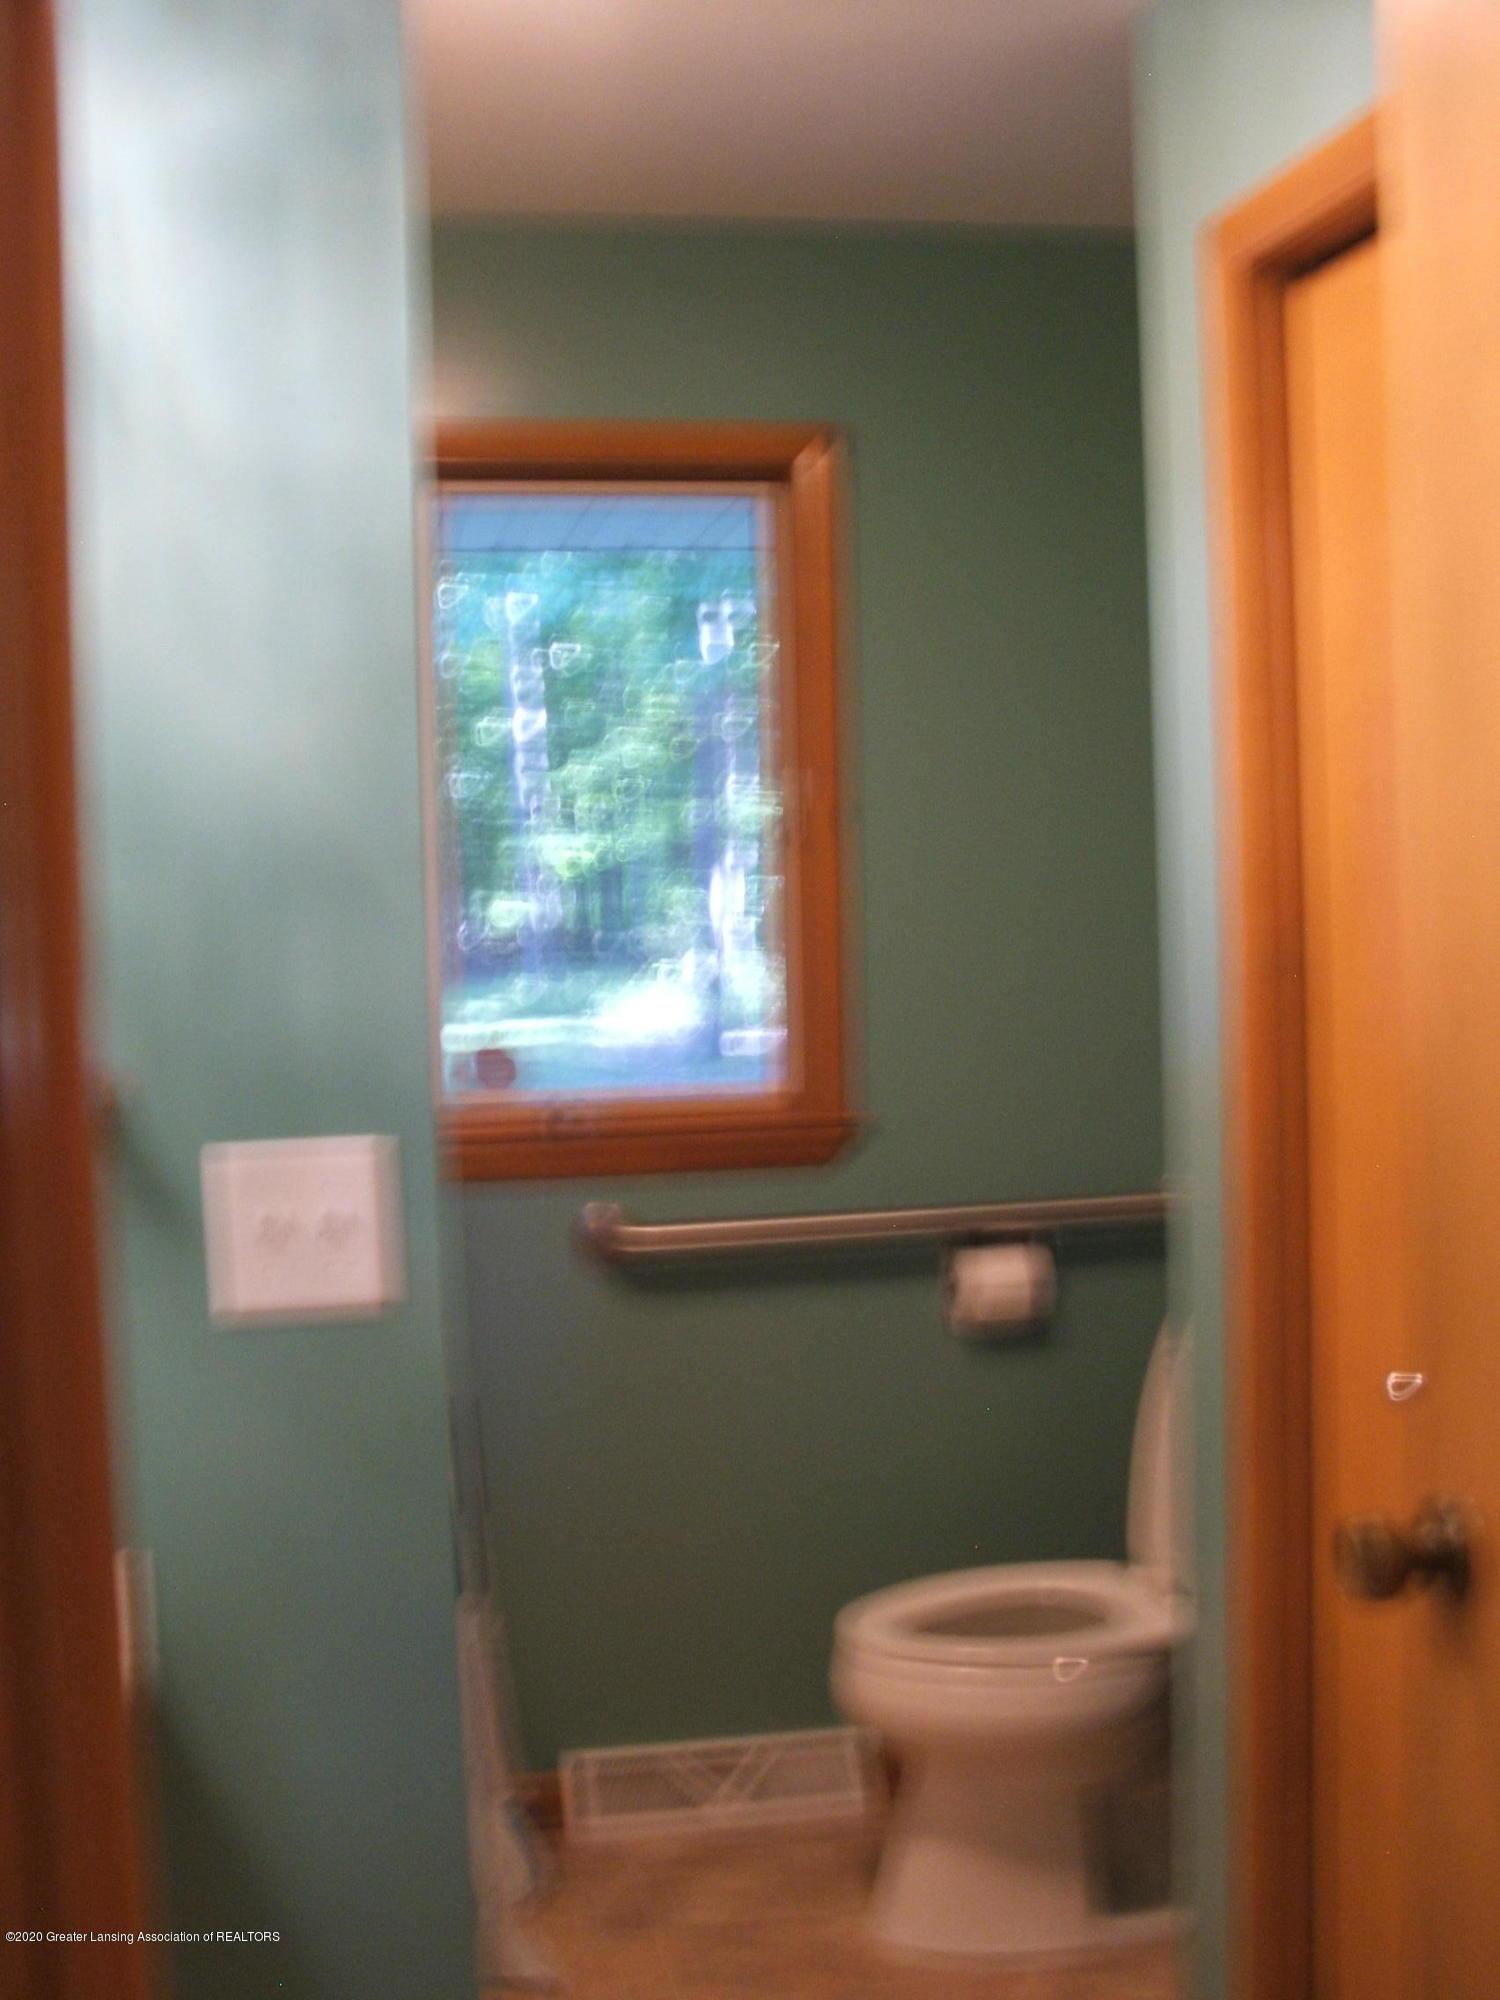 2293 M 21  - Bathroom - 11